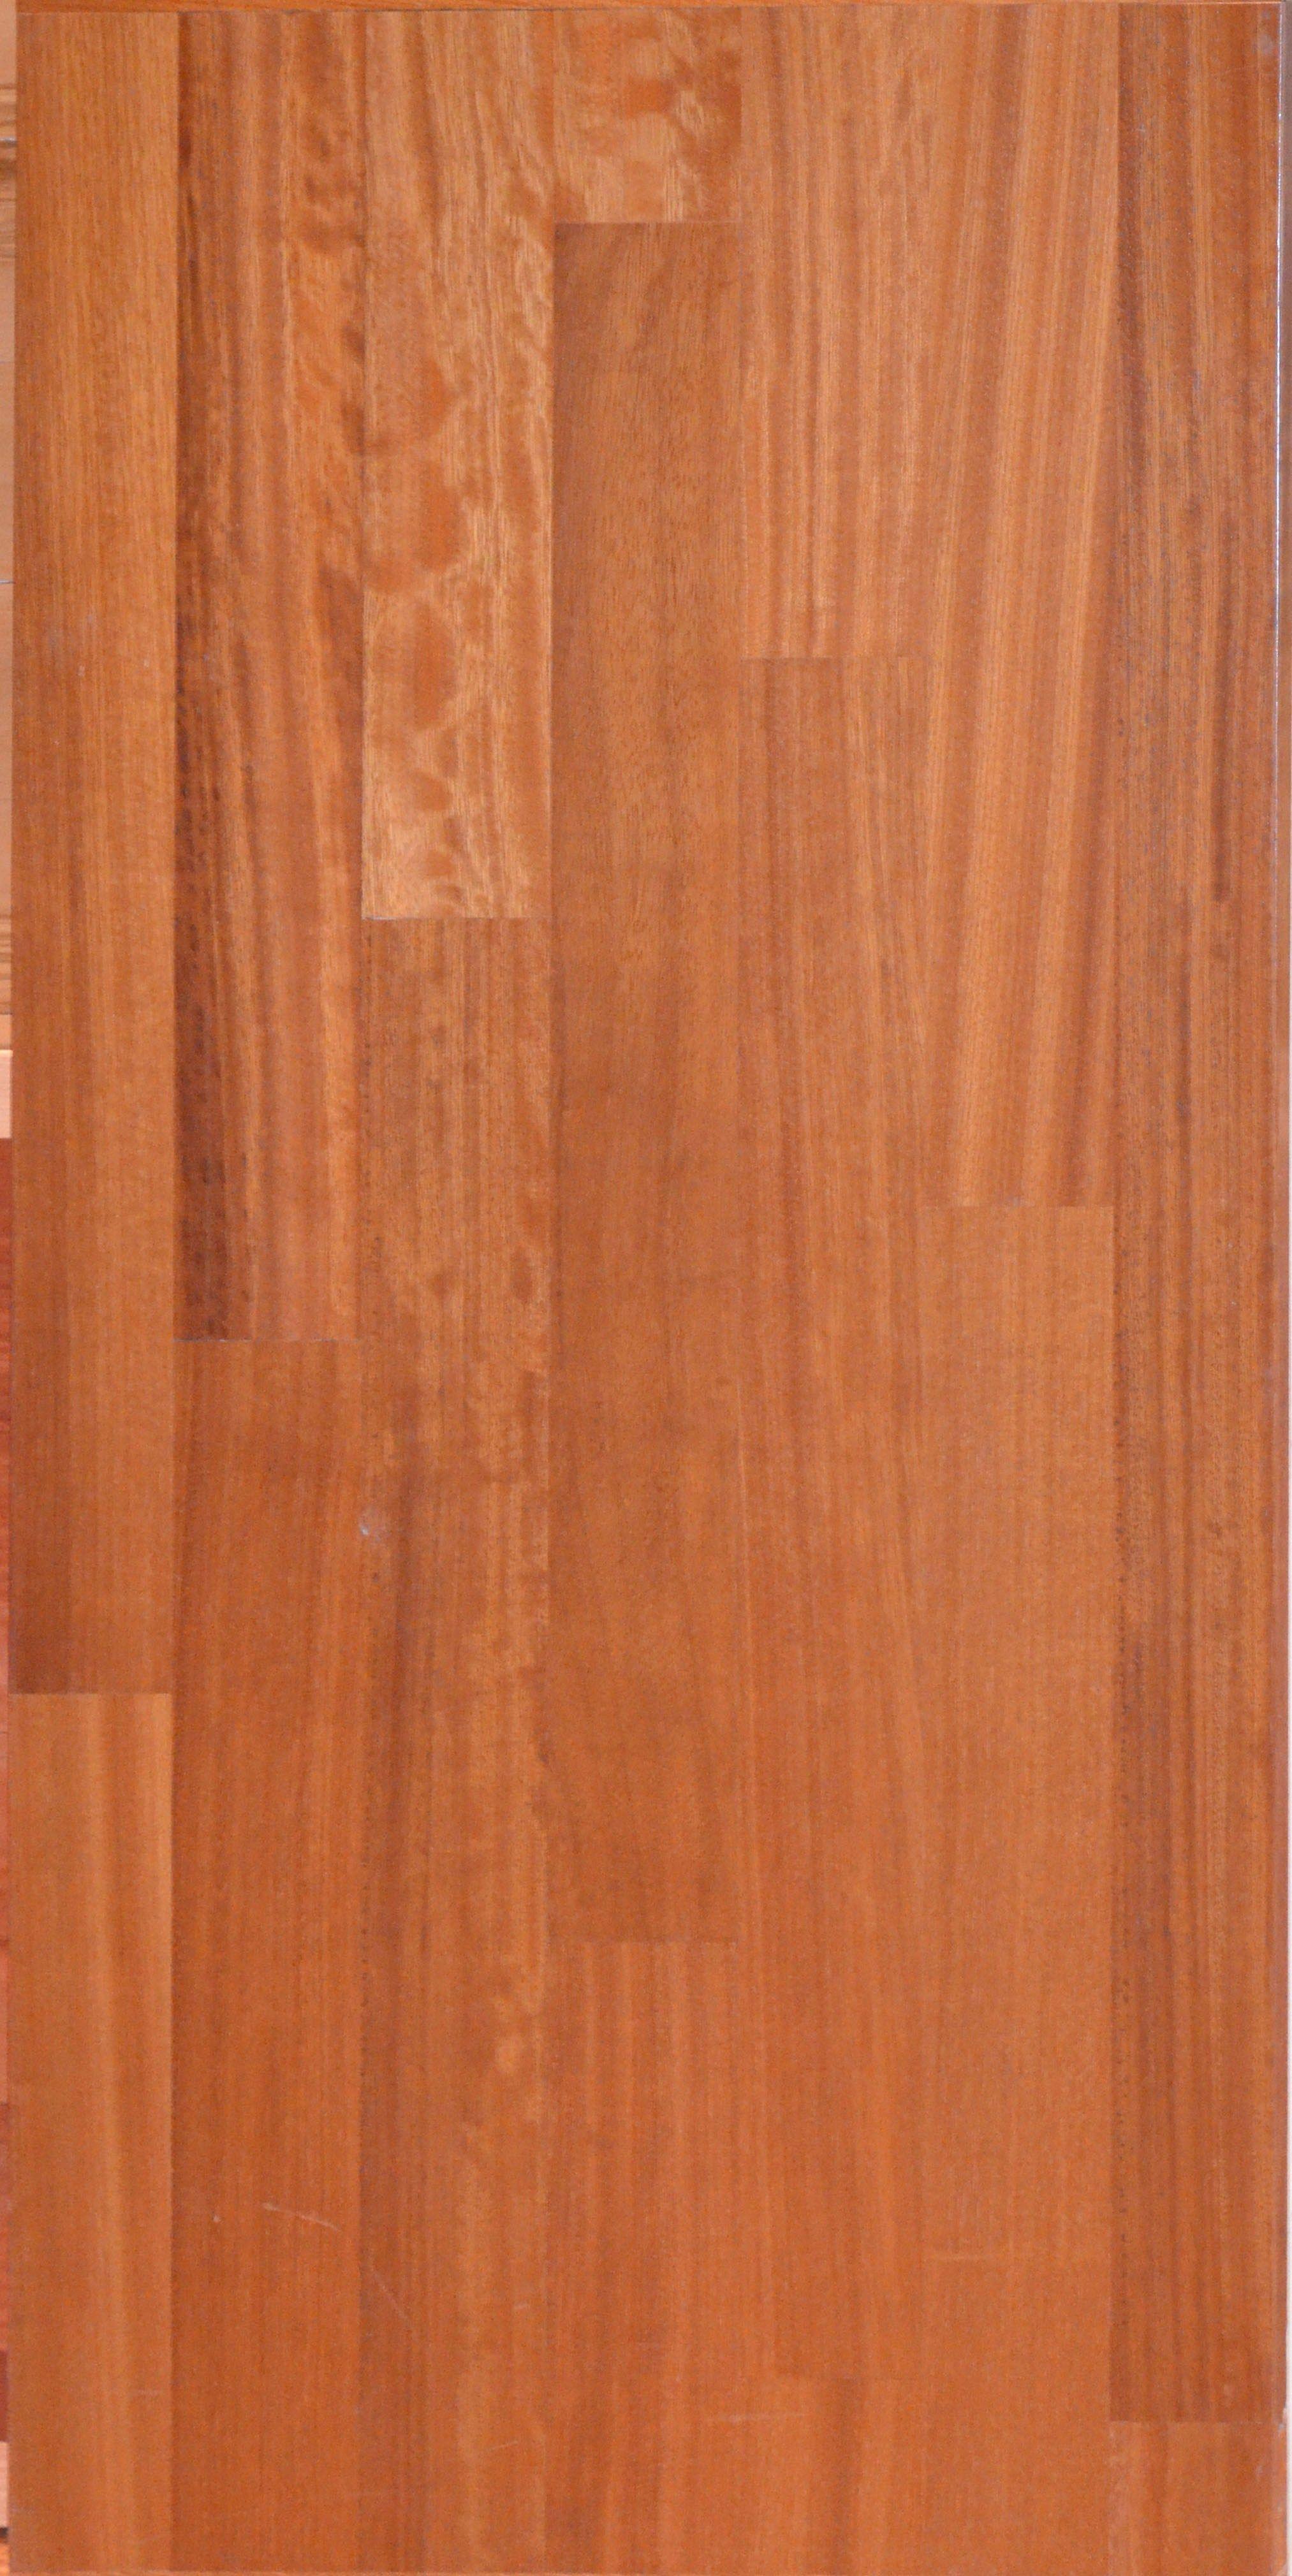 exotic walnut hardwood flooring of african teak our exotic hardwood flooring pinterest teak and house pertaining to african teak